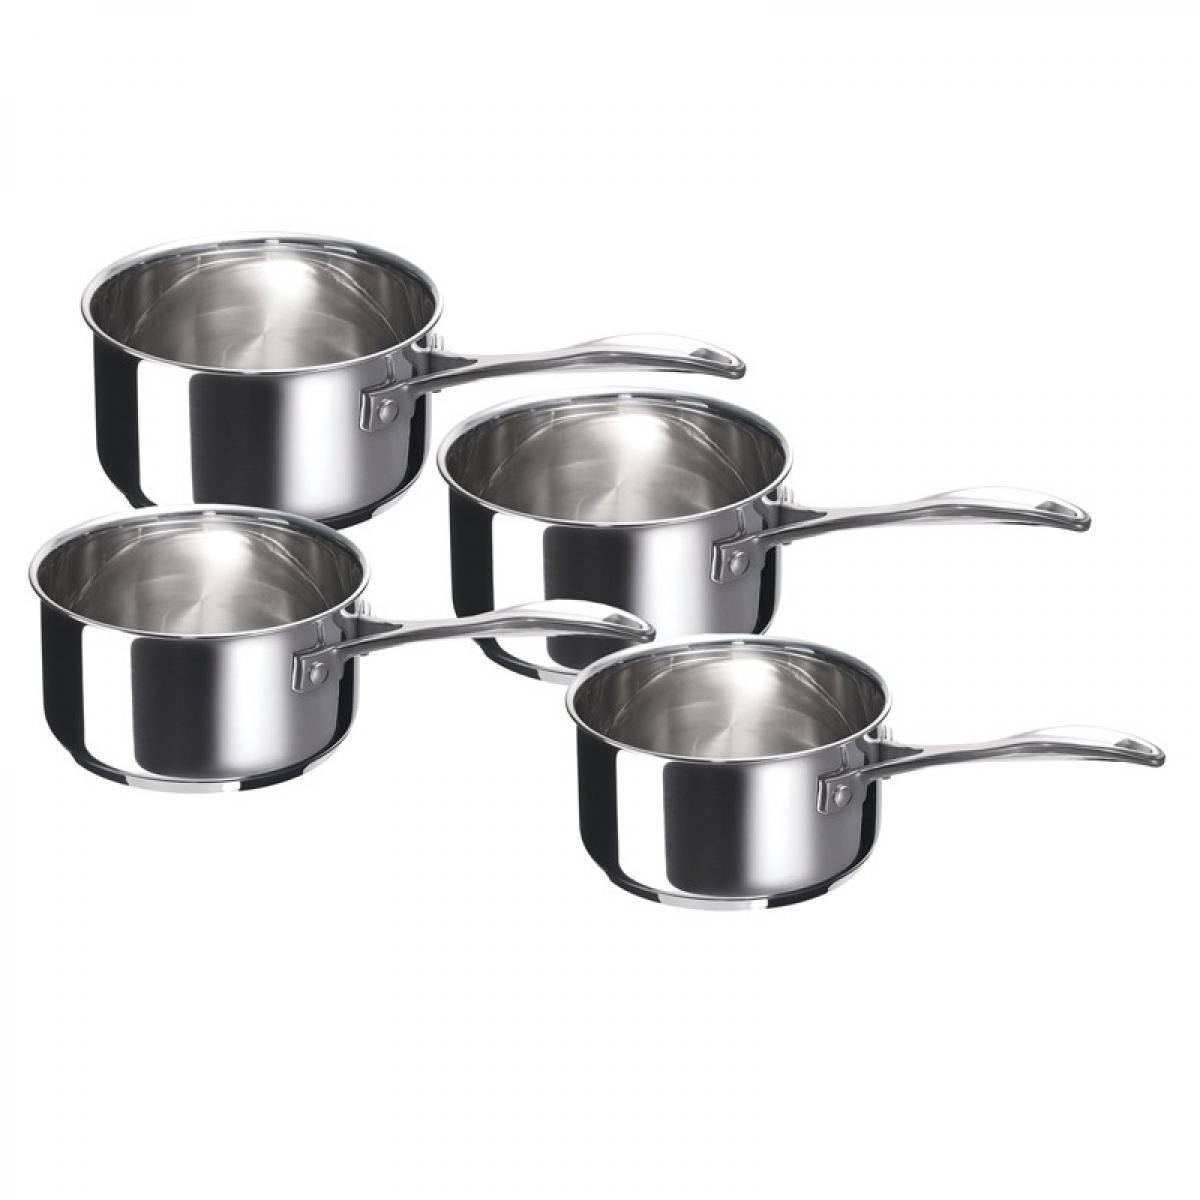 Beka Beka - Série de 4 casseroles Chef - 14 à 20 cm